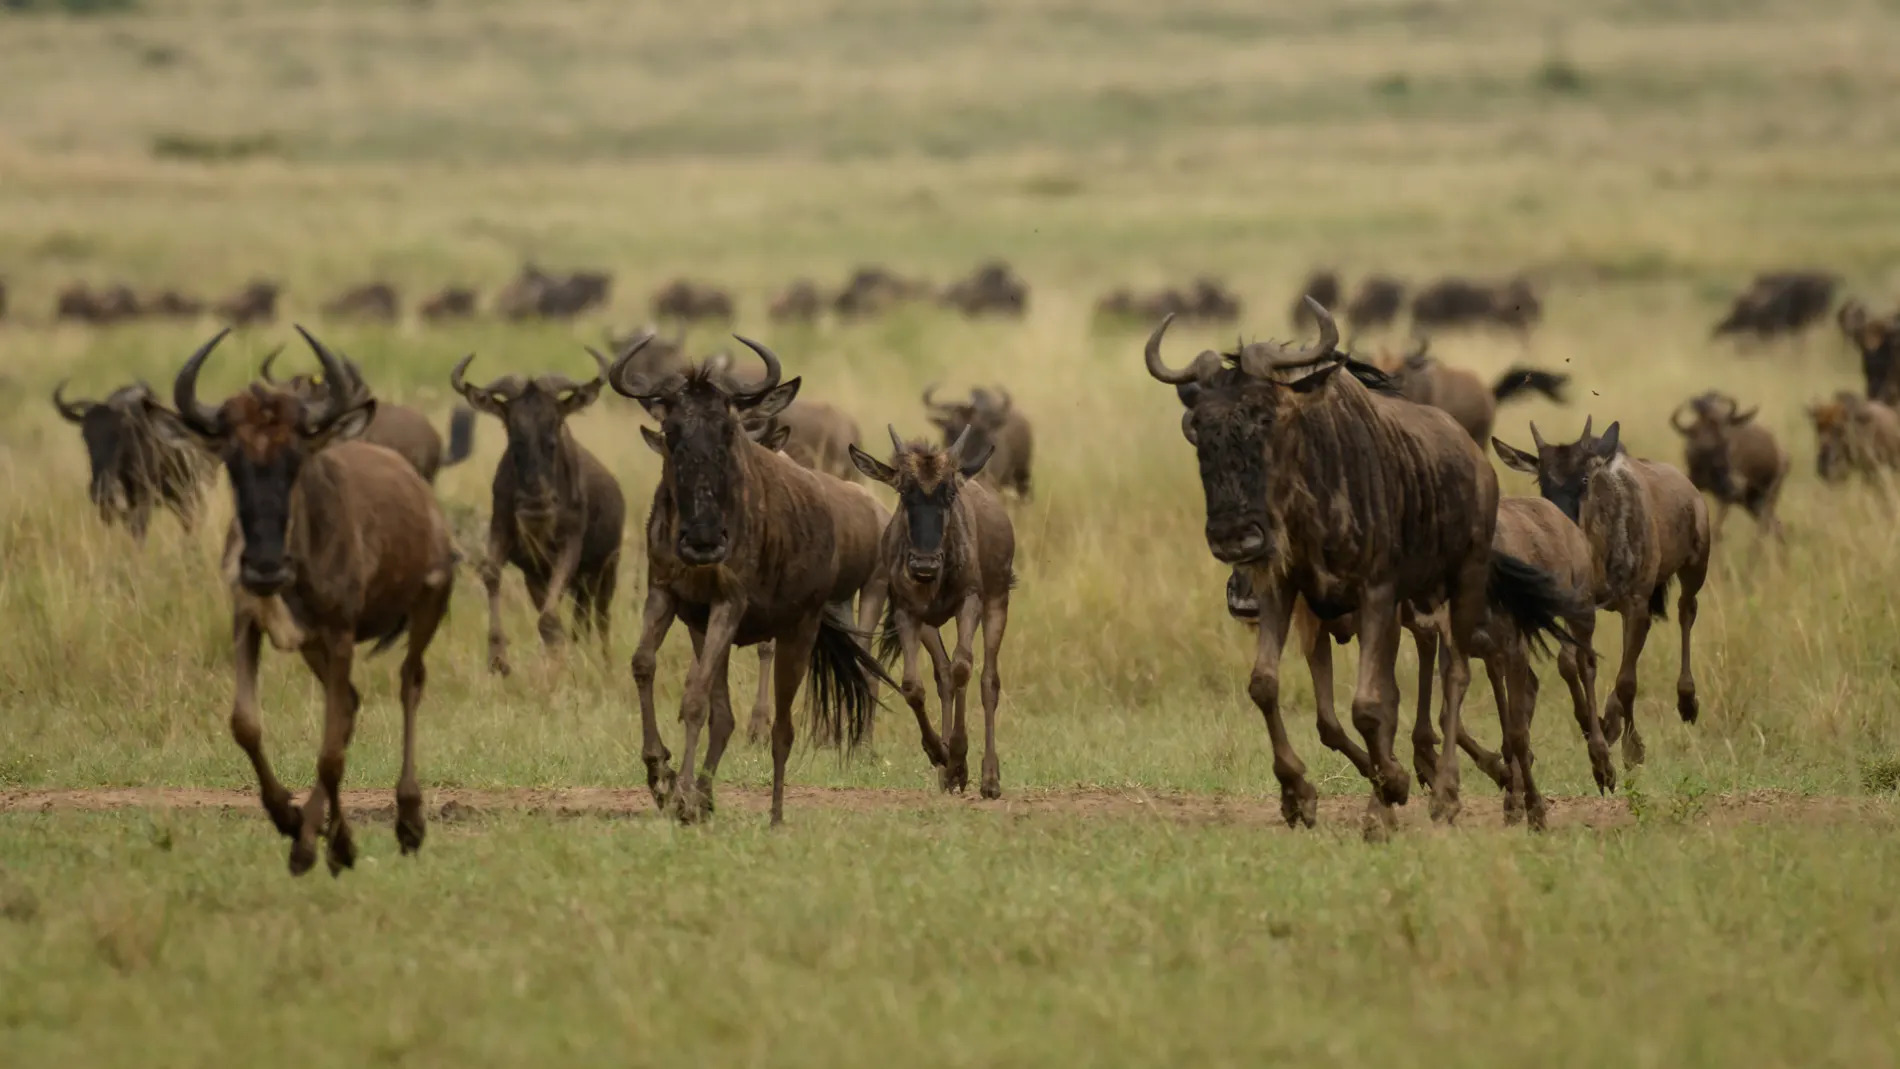 Group of wildebeest running